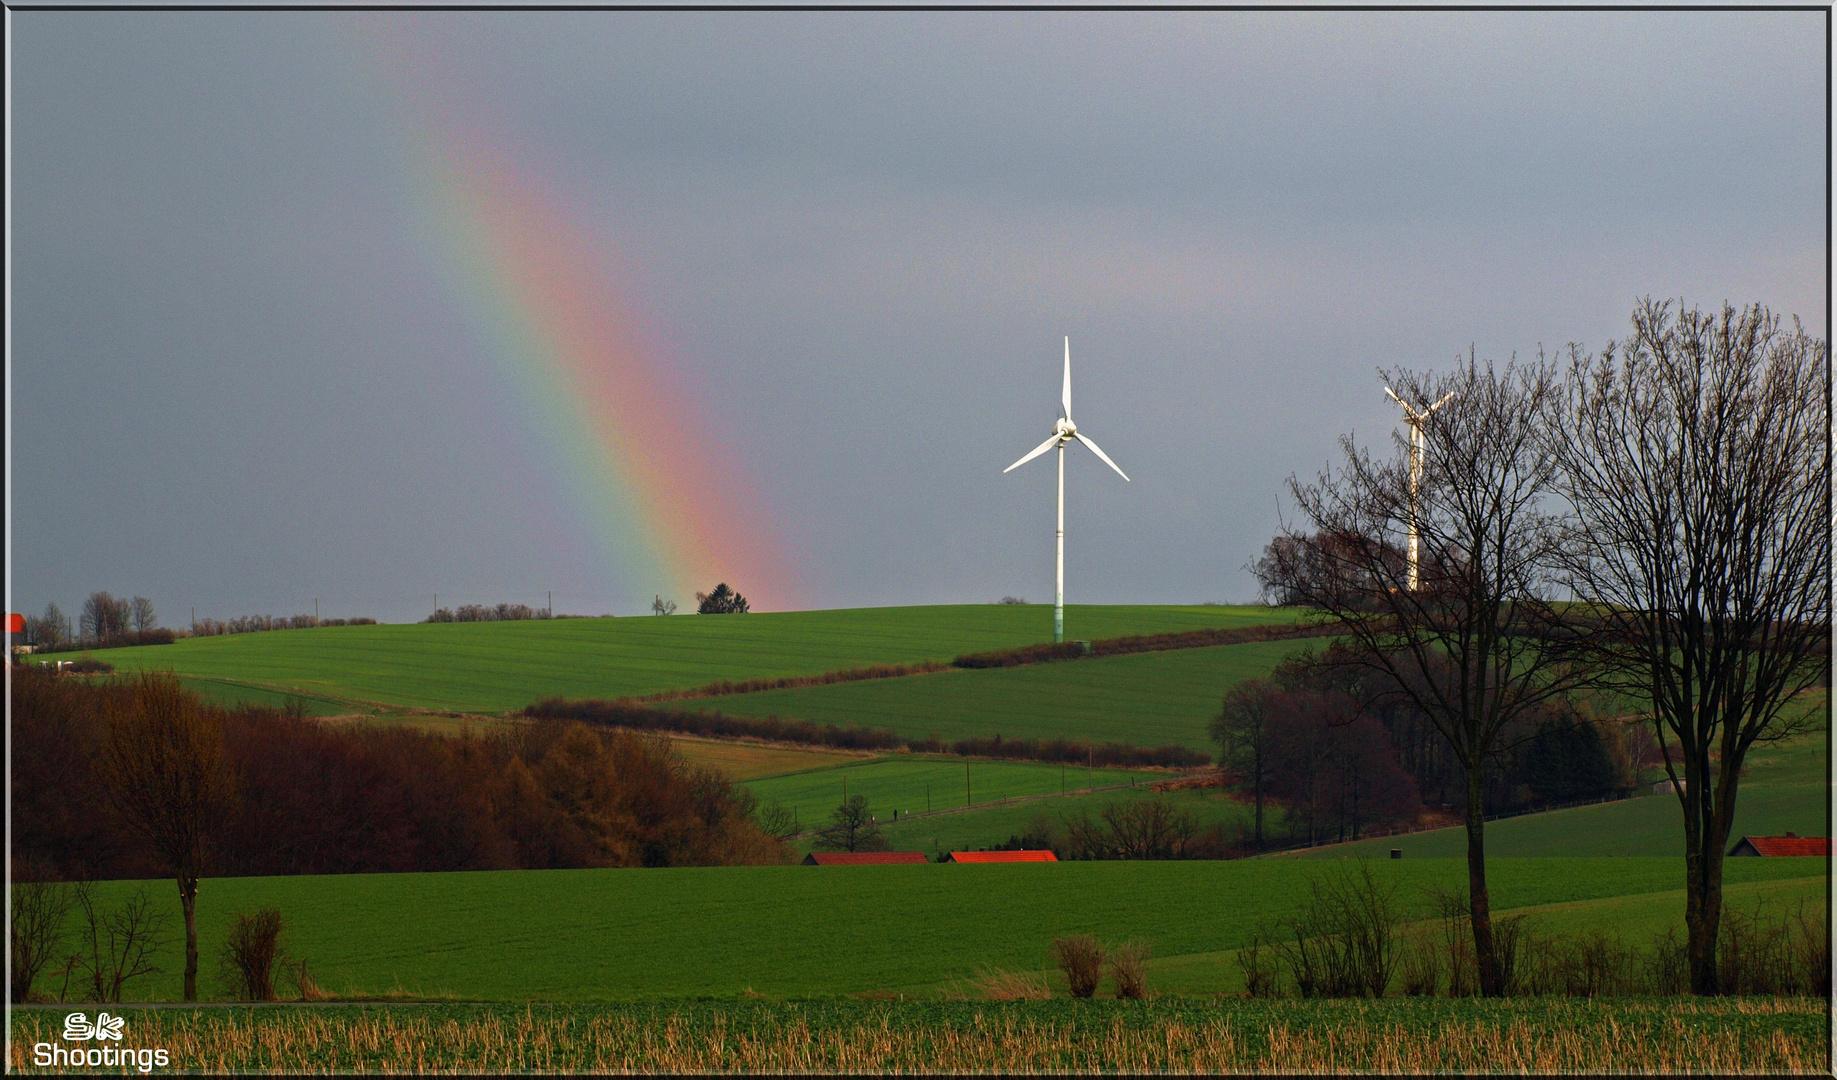 Rainbow to the Sky